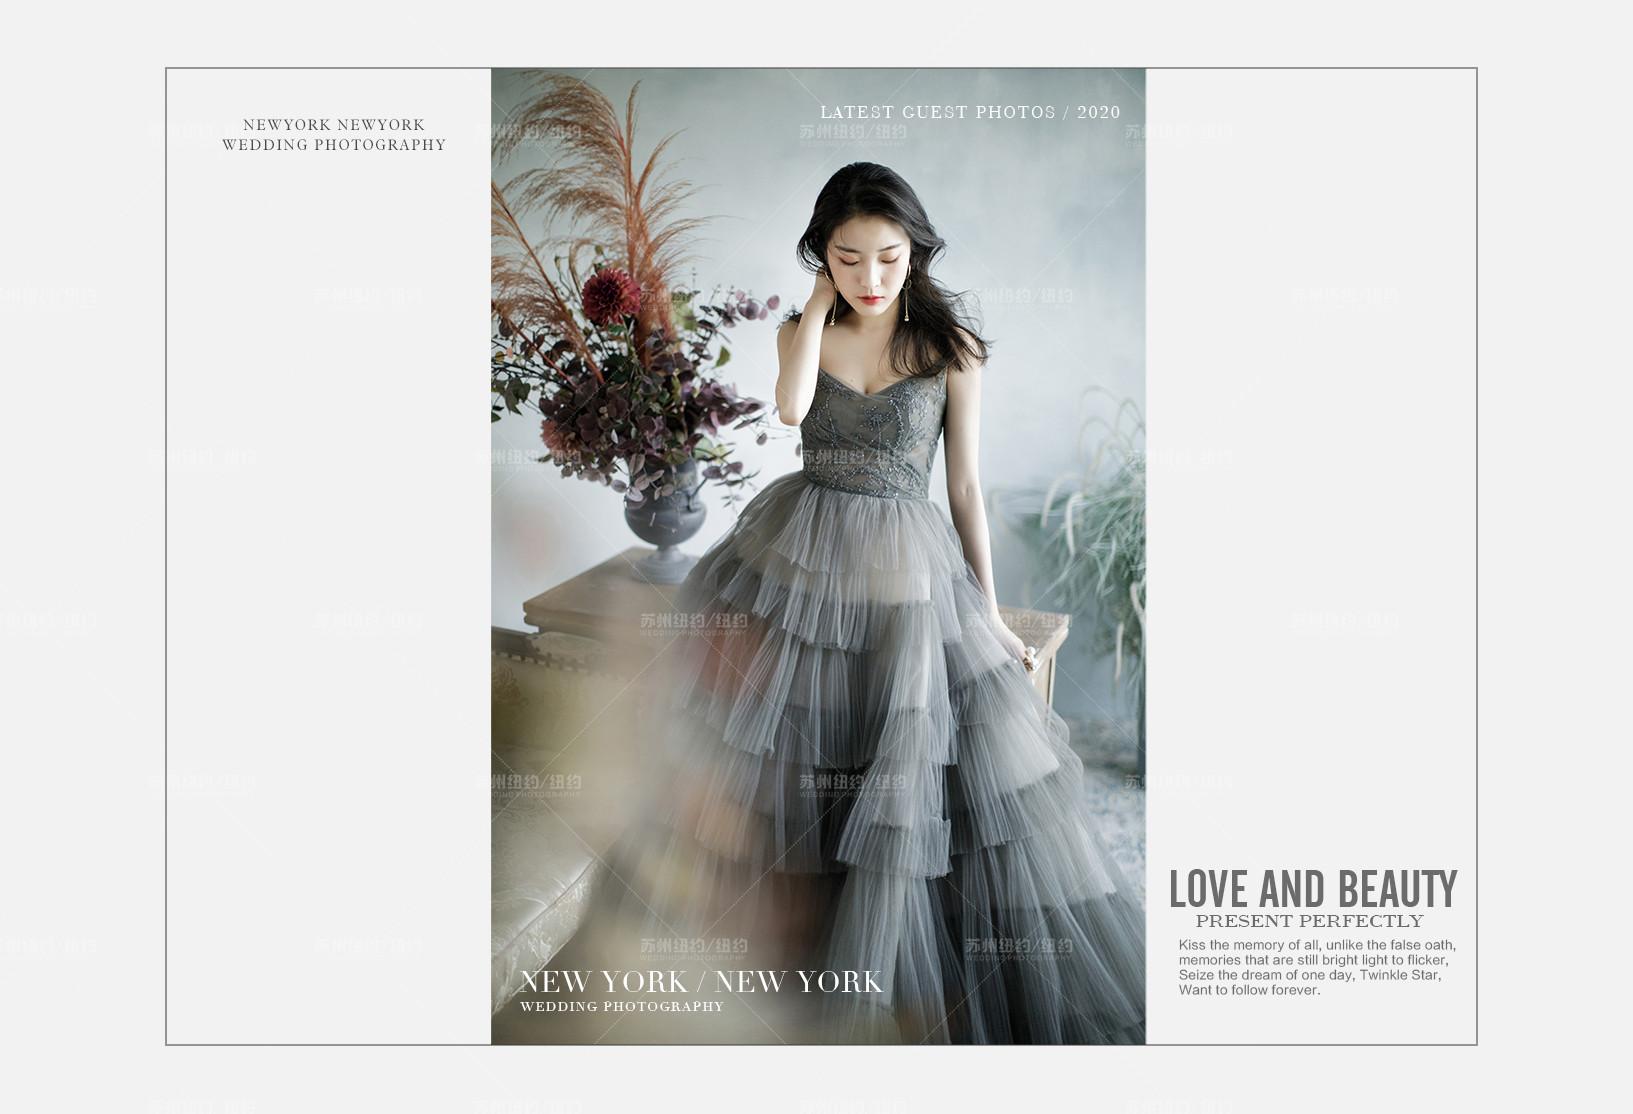 Mr.金 & Ms.满(纽约纽约最新客照)婚纱摄影照